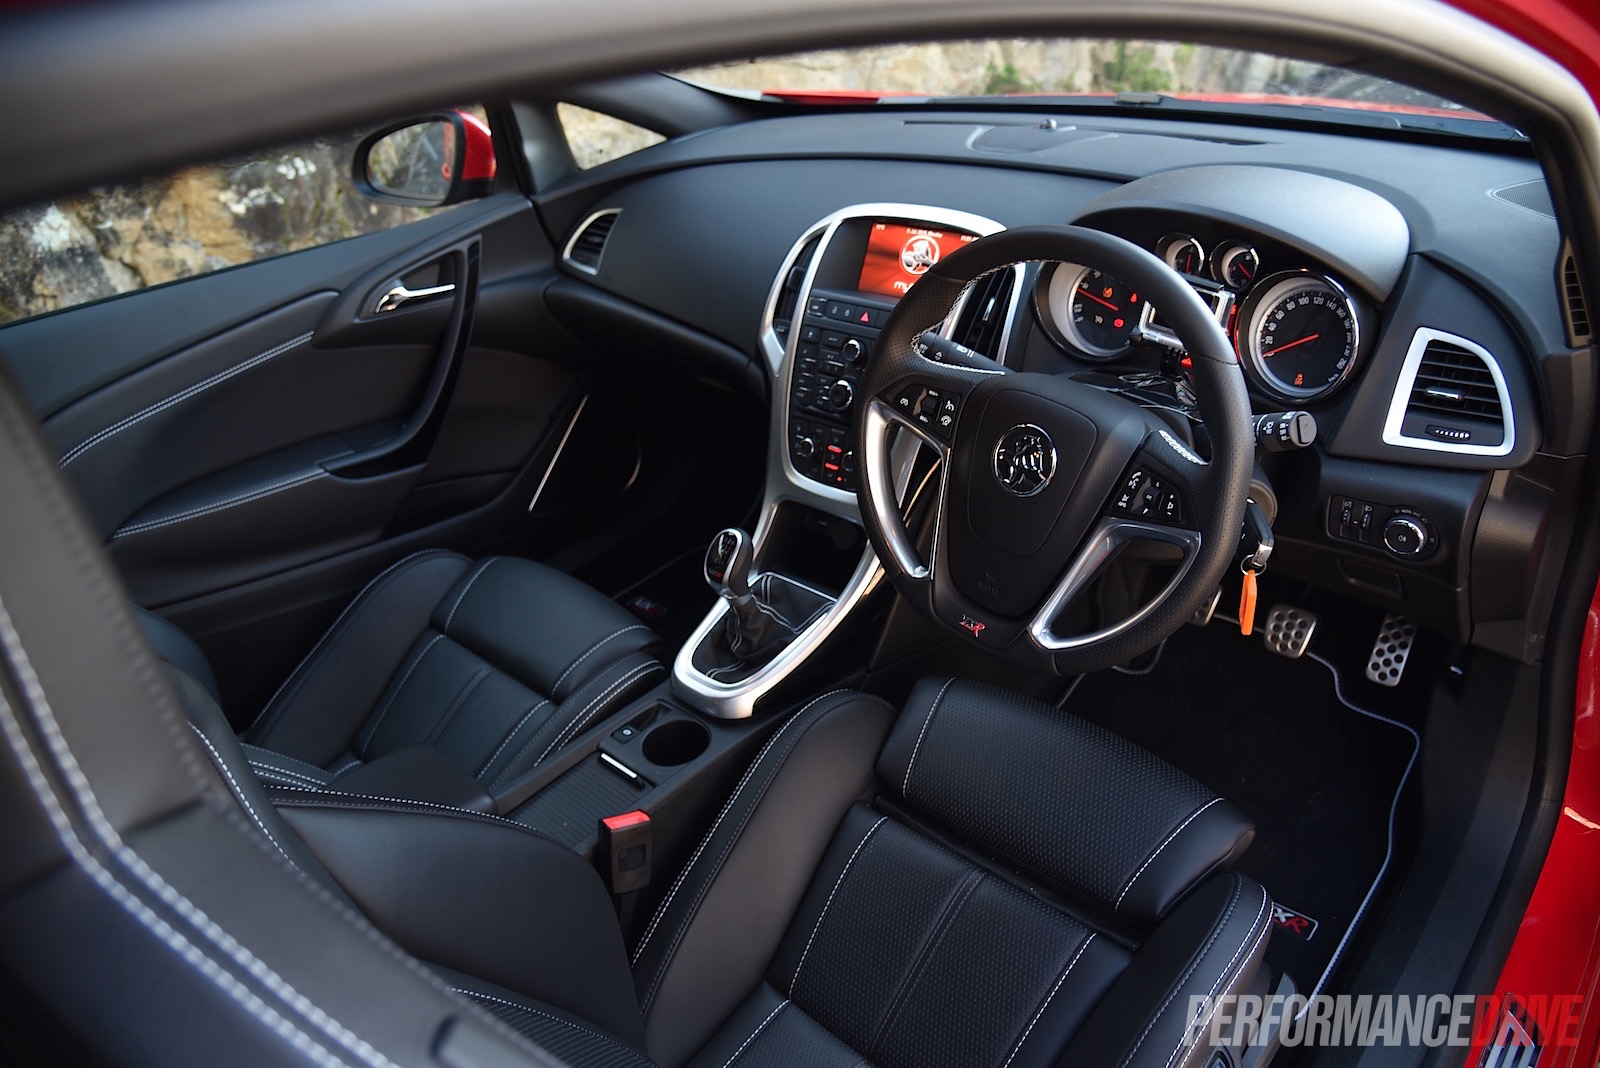 2015 Holden Astra Vxr Review Video Performancedrive